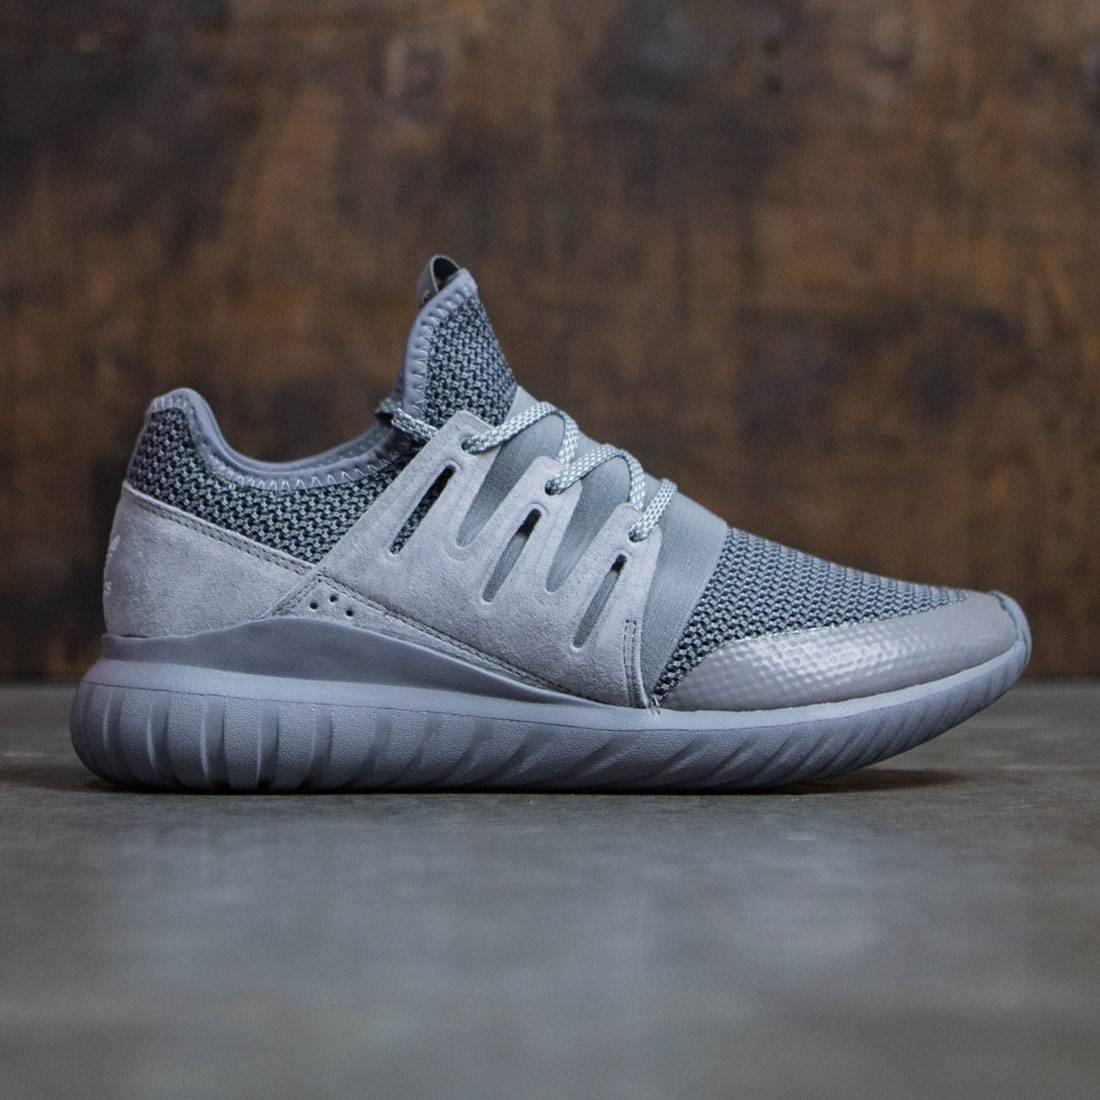 Adidas Tubular Defiant Shoes stylefile Cheap Adidas Tubular